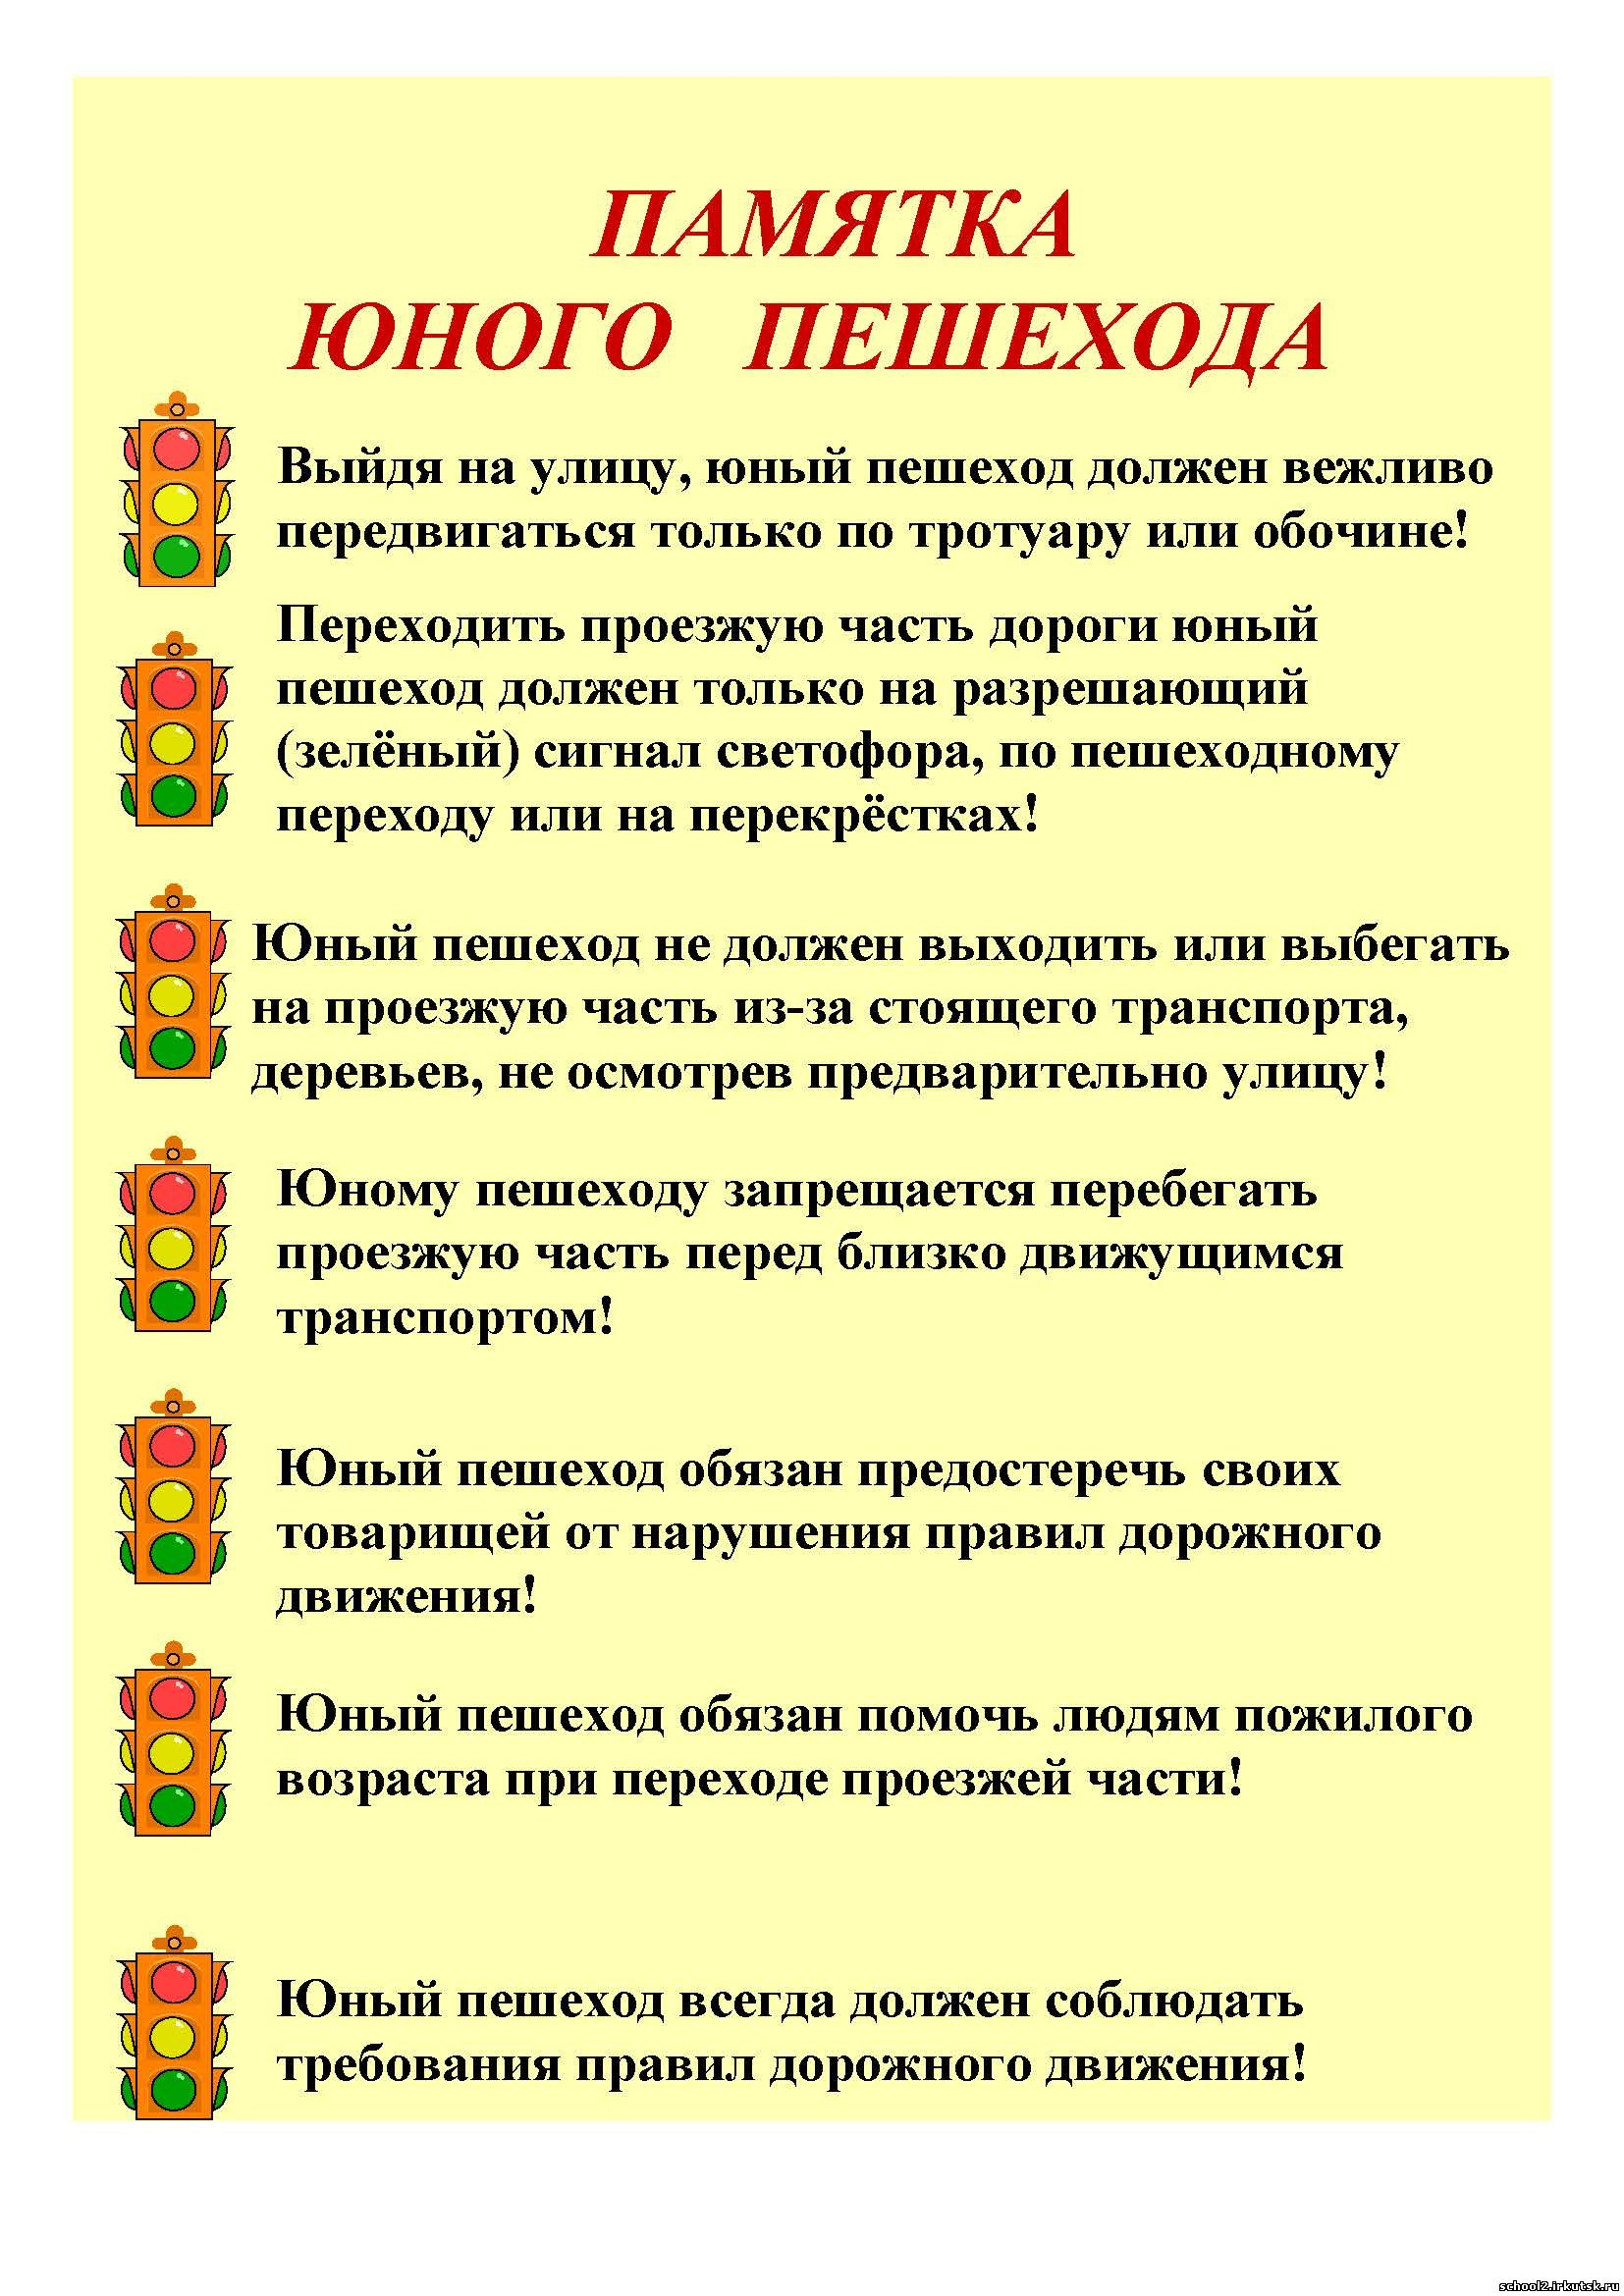 http://ds49.nevinsk.ru/wp-content/uploads/2015/08/pamjatka_junogo_pesheda.jpg